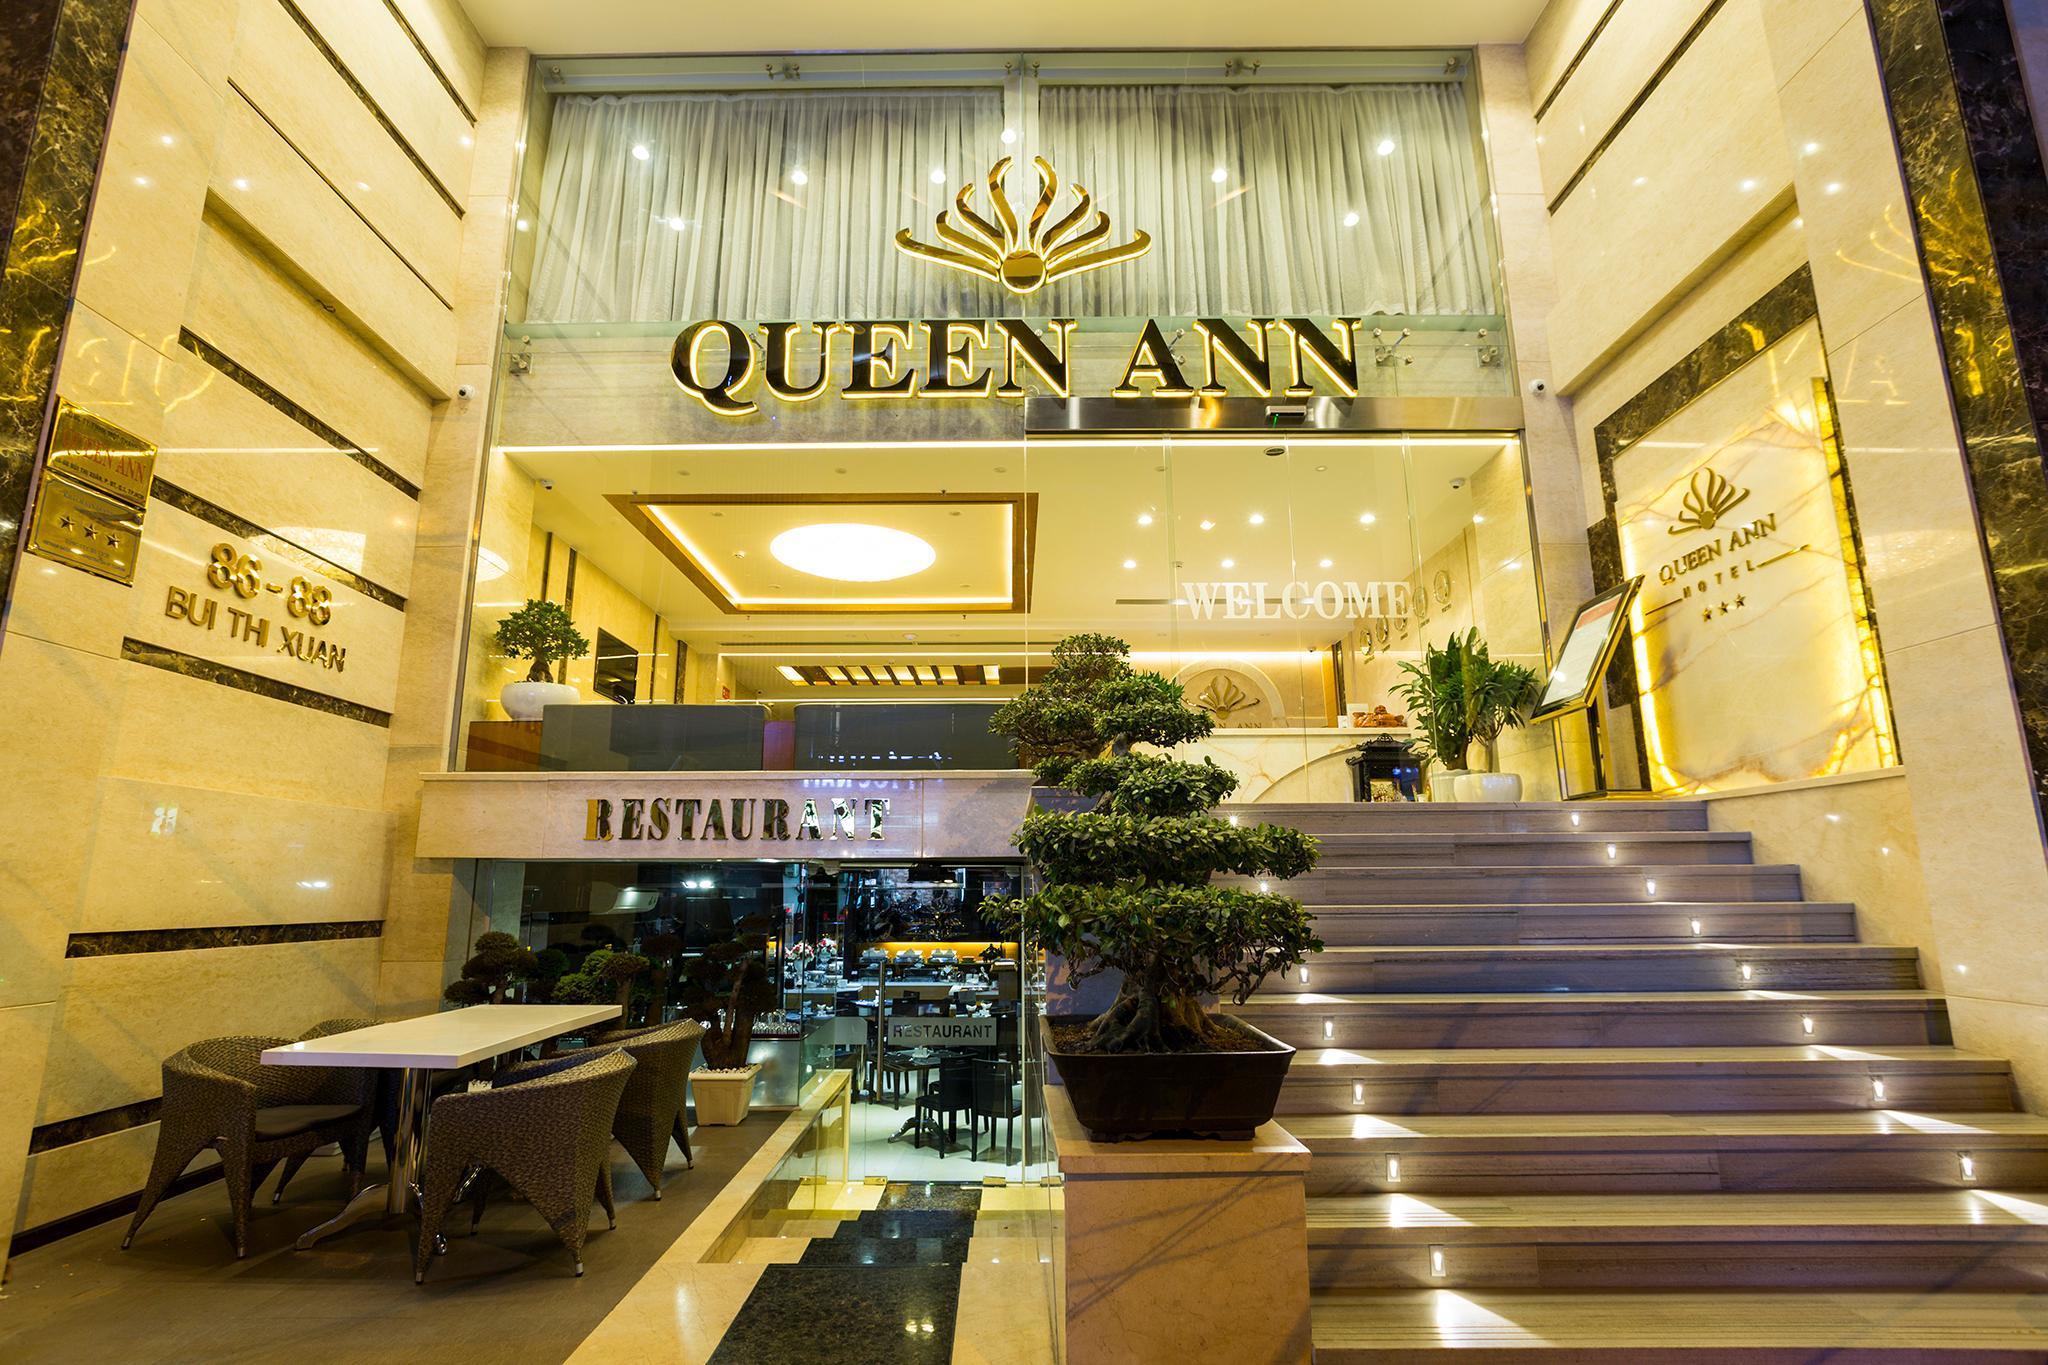 Khách Sạn Queen Ann Hồ Chí Minh